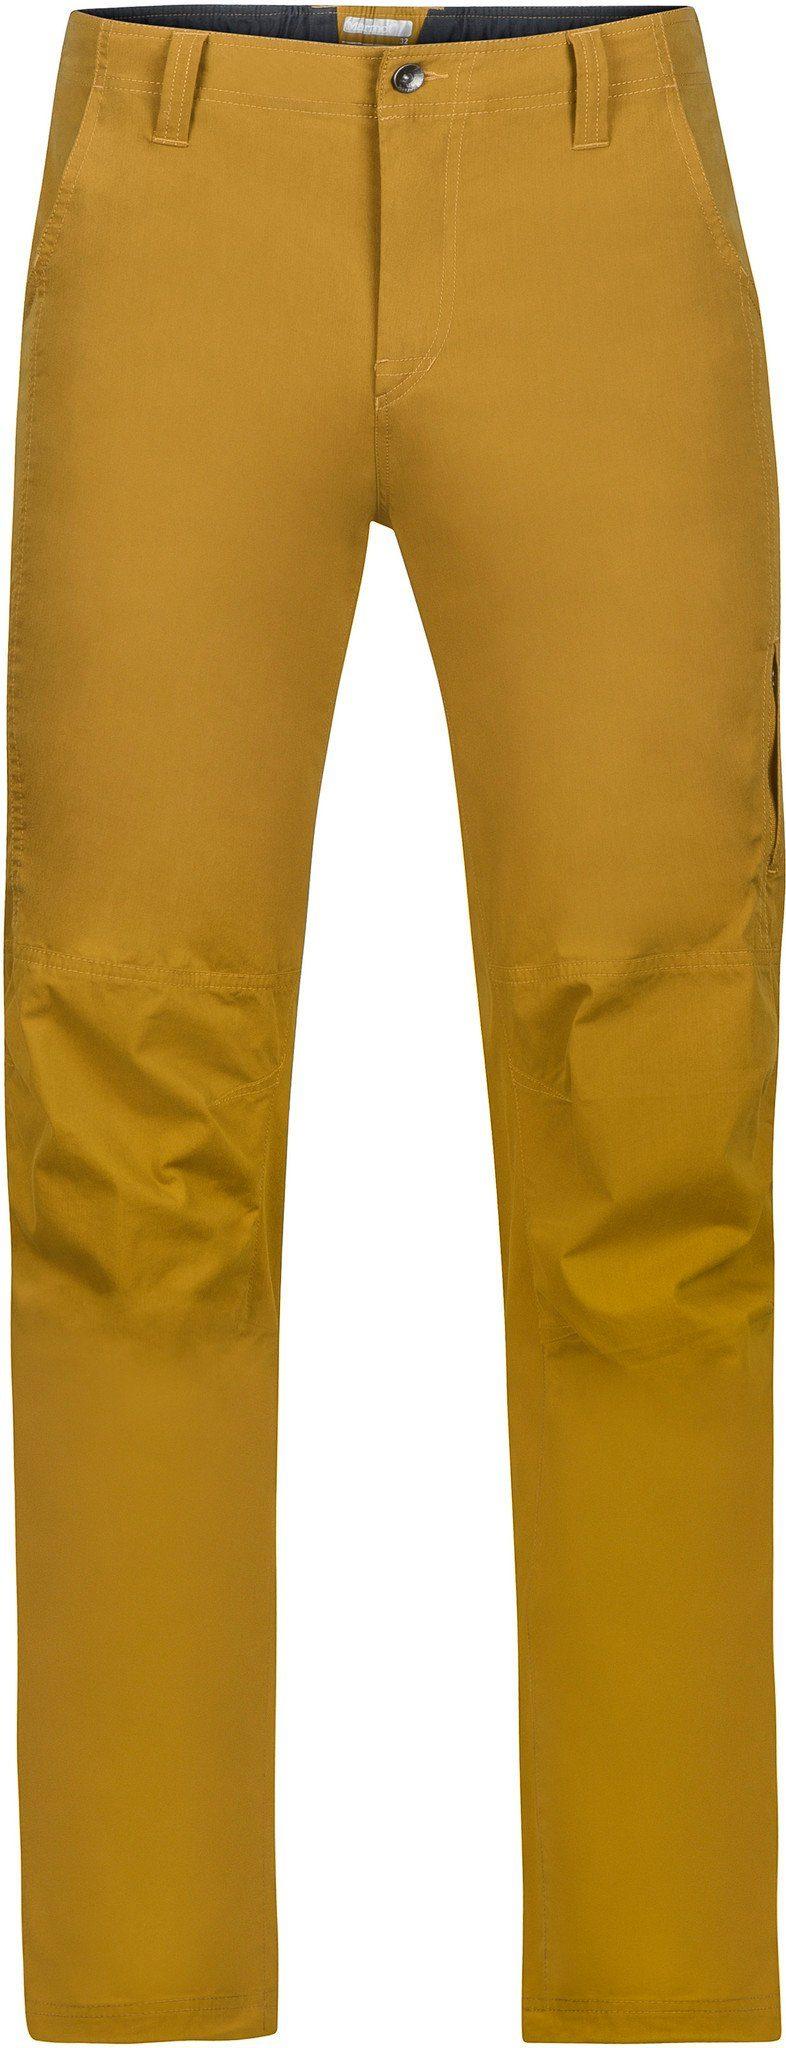 Marmot Outdoorhose »Durango Pants Men«